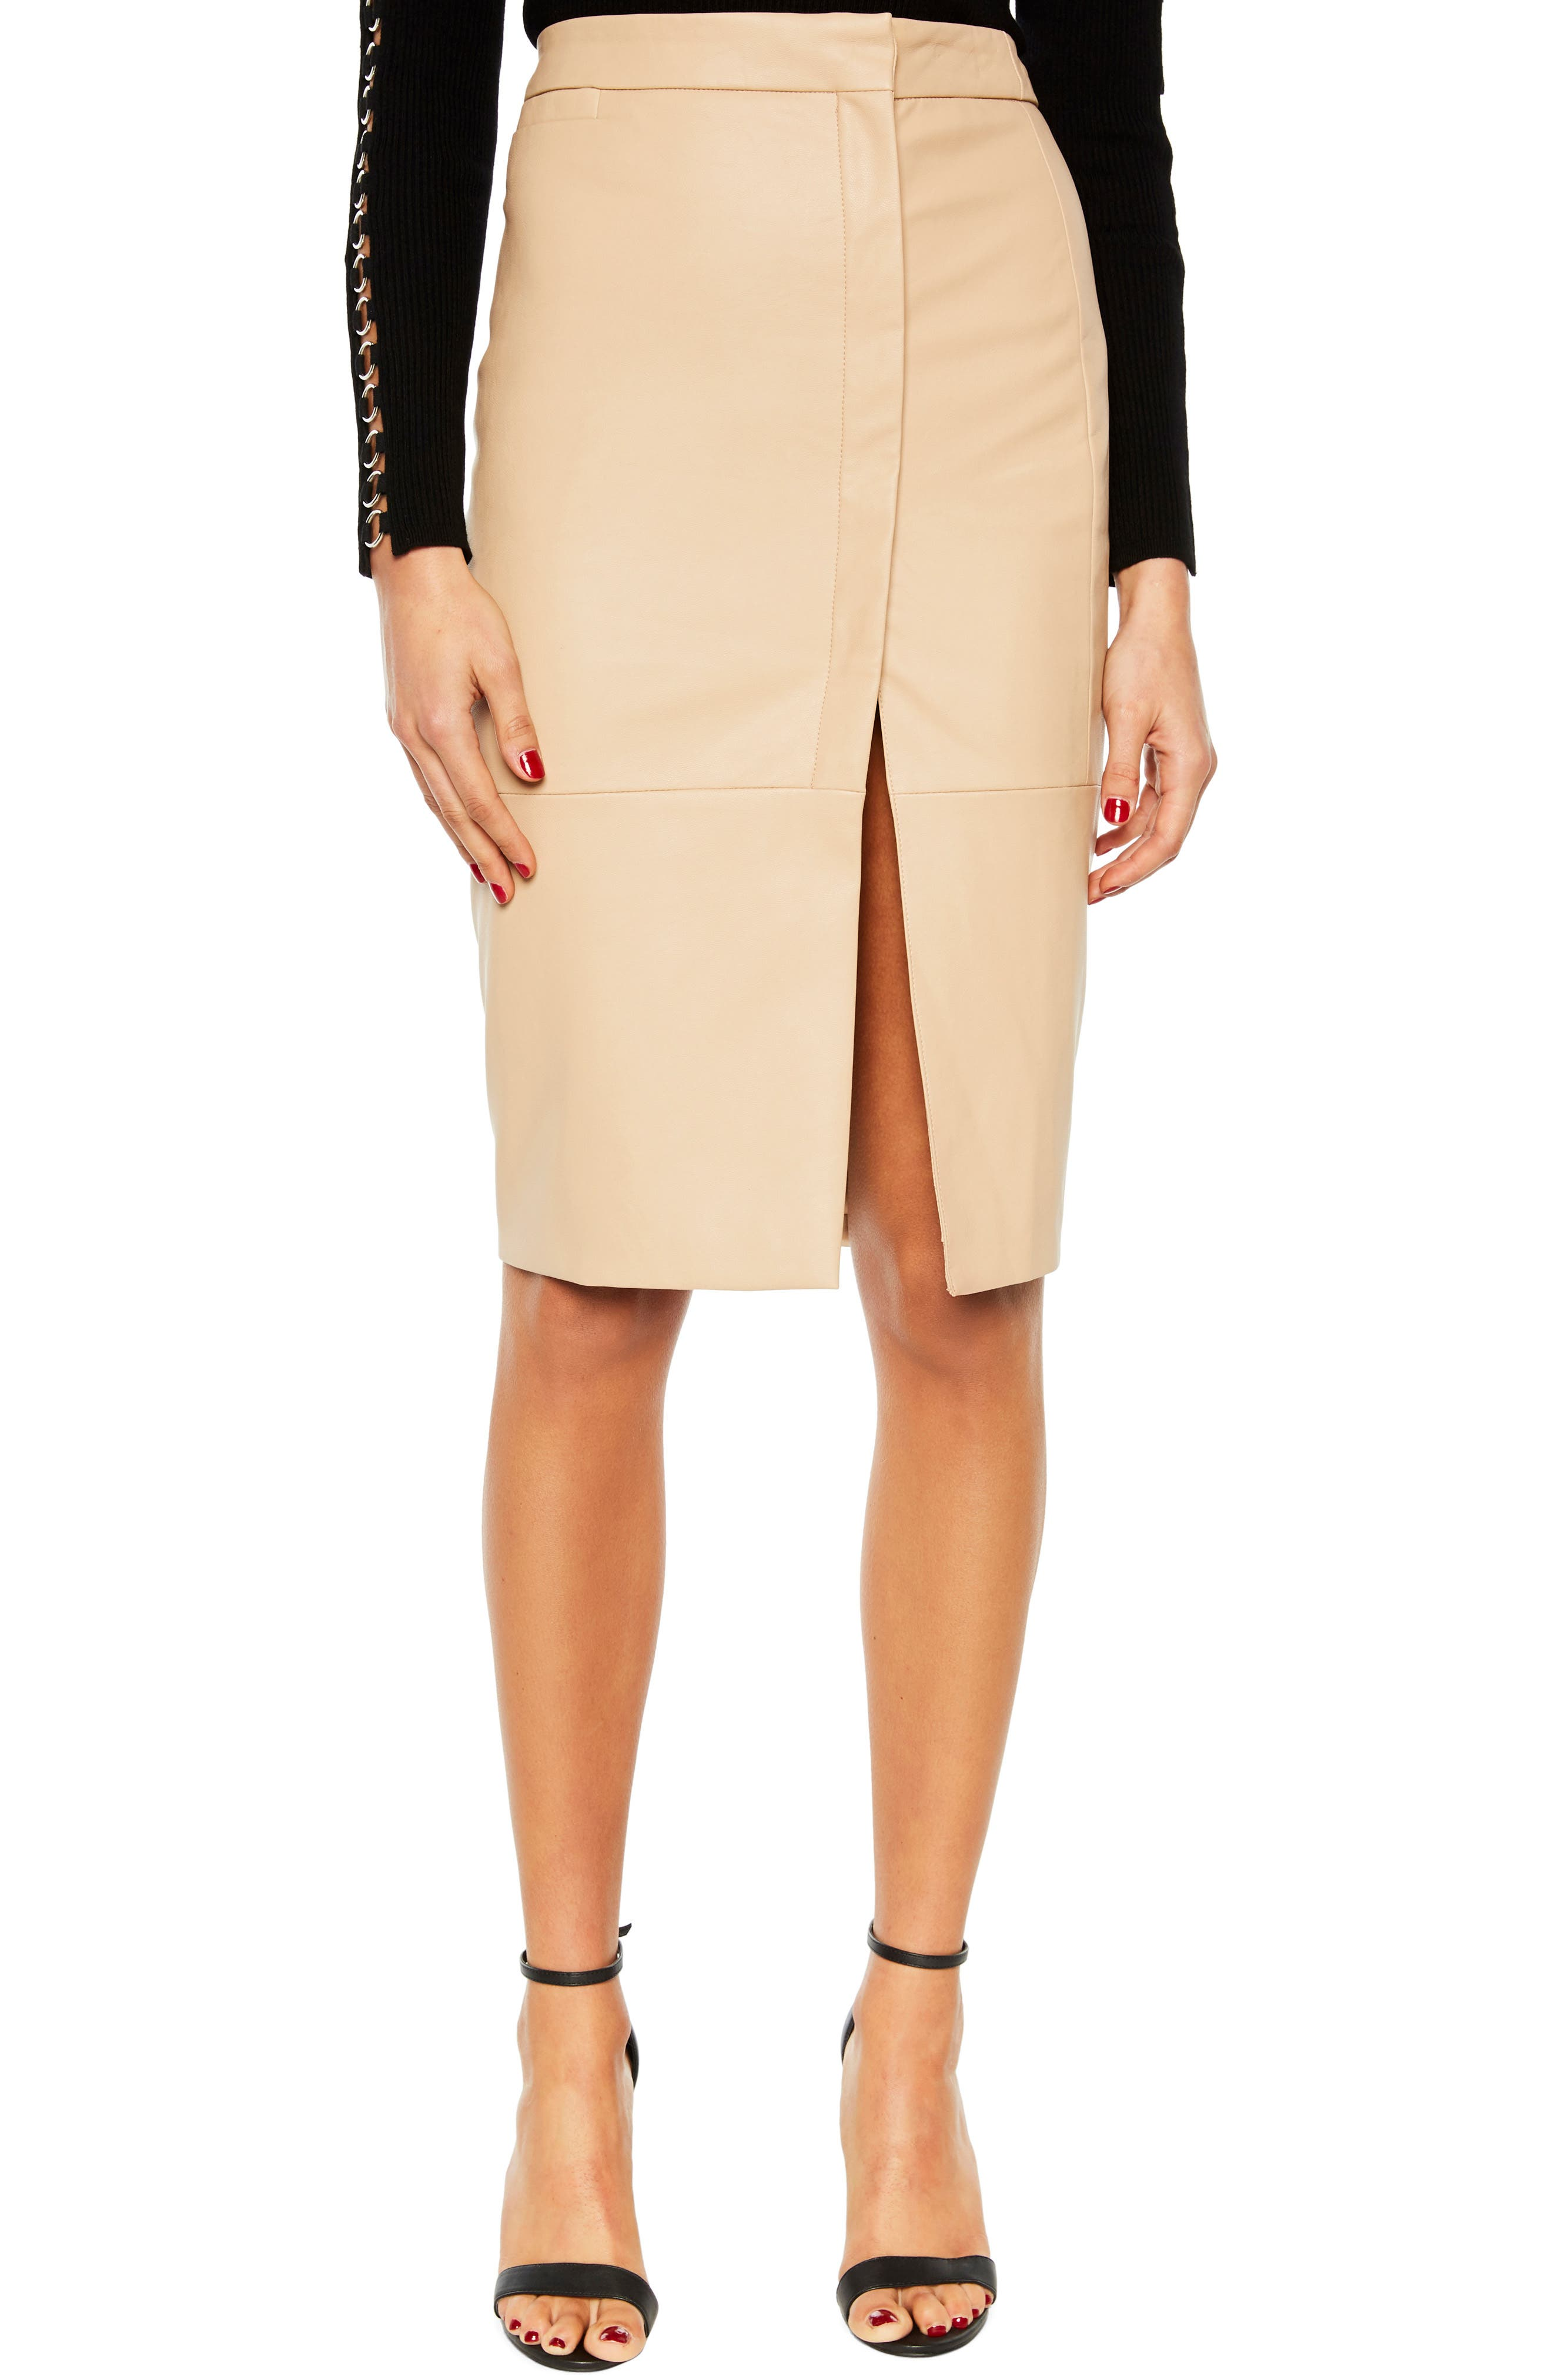 Dee Faux Leather Pencil Skirt,                             Main thumbnail 1, color,                             250